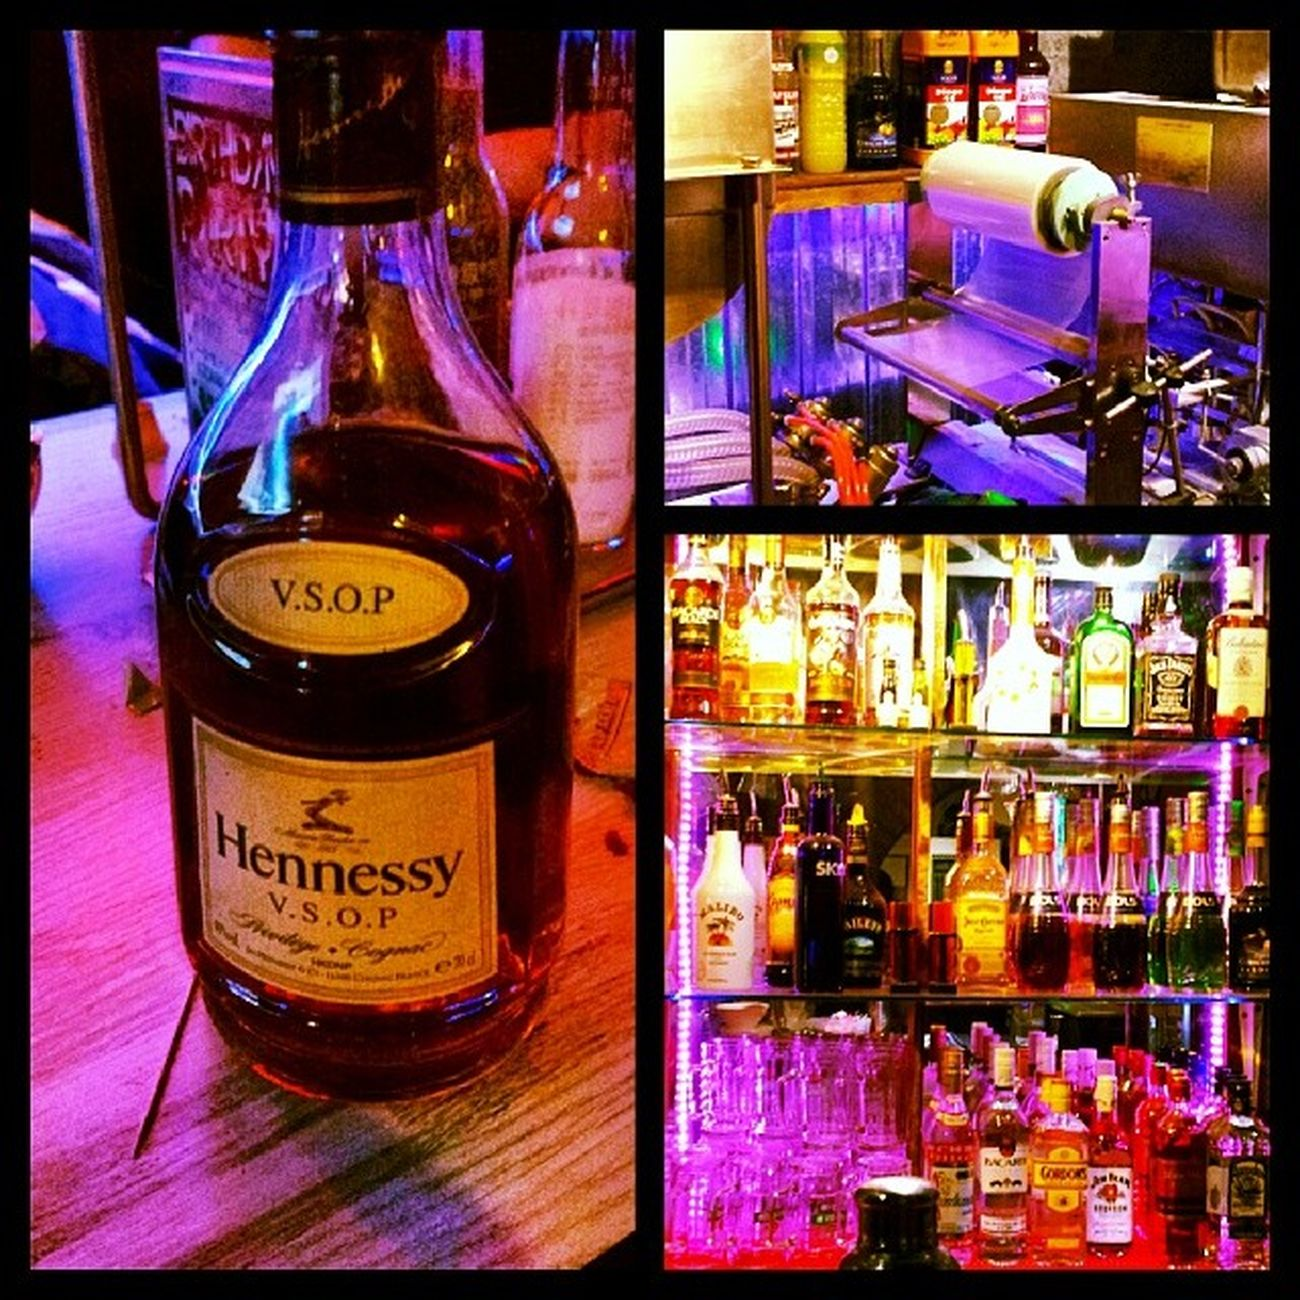 Jellofactory China CC Hennessy V.S.O.Pcognacpartymf2mf4brothersgoodnightdance